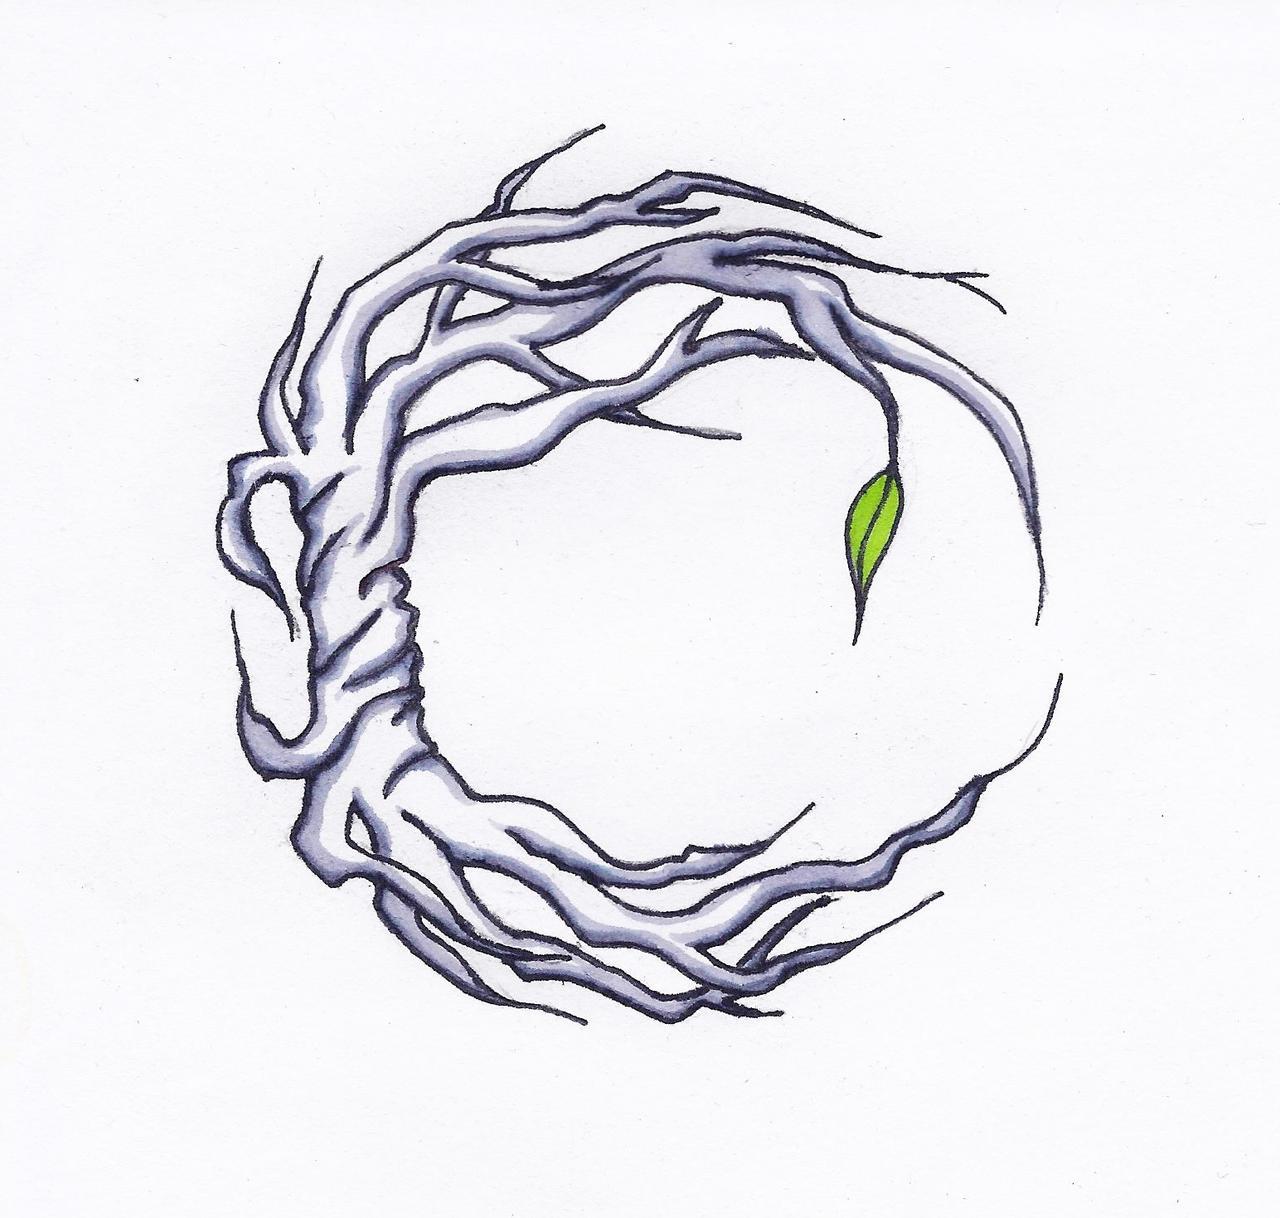 Tree of life tattoo design by beautifulartisabang on deviantart